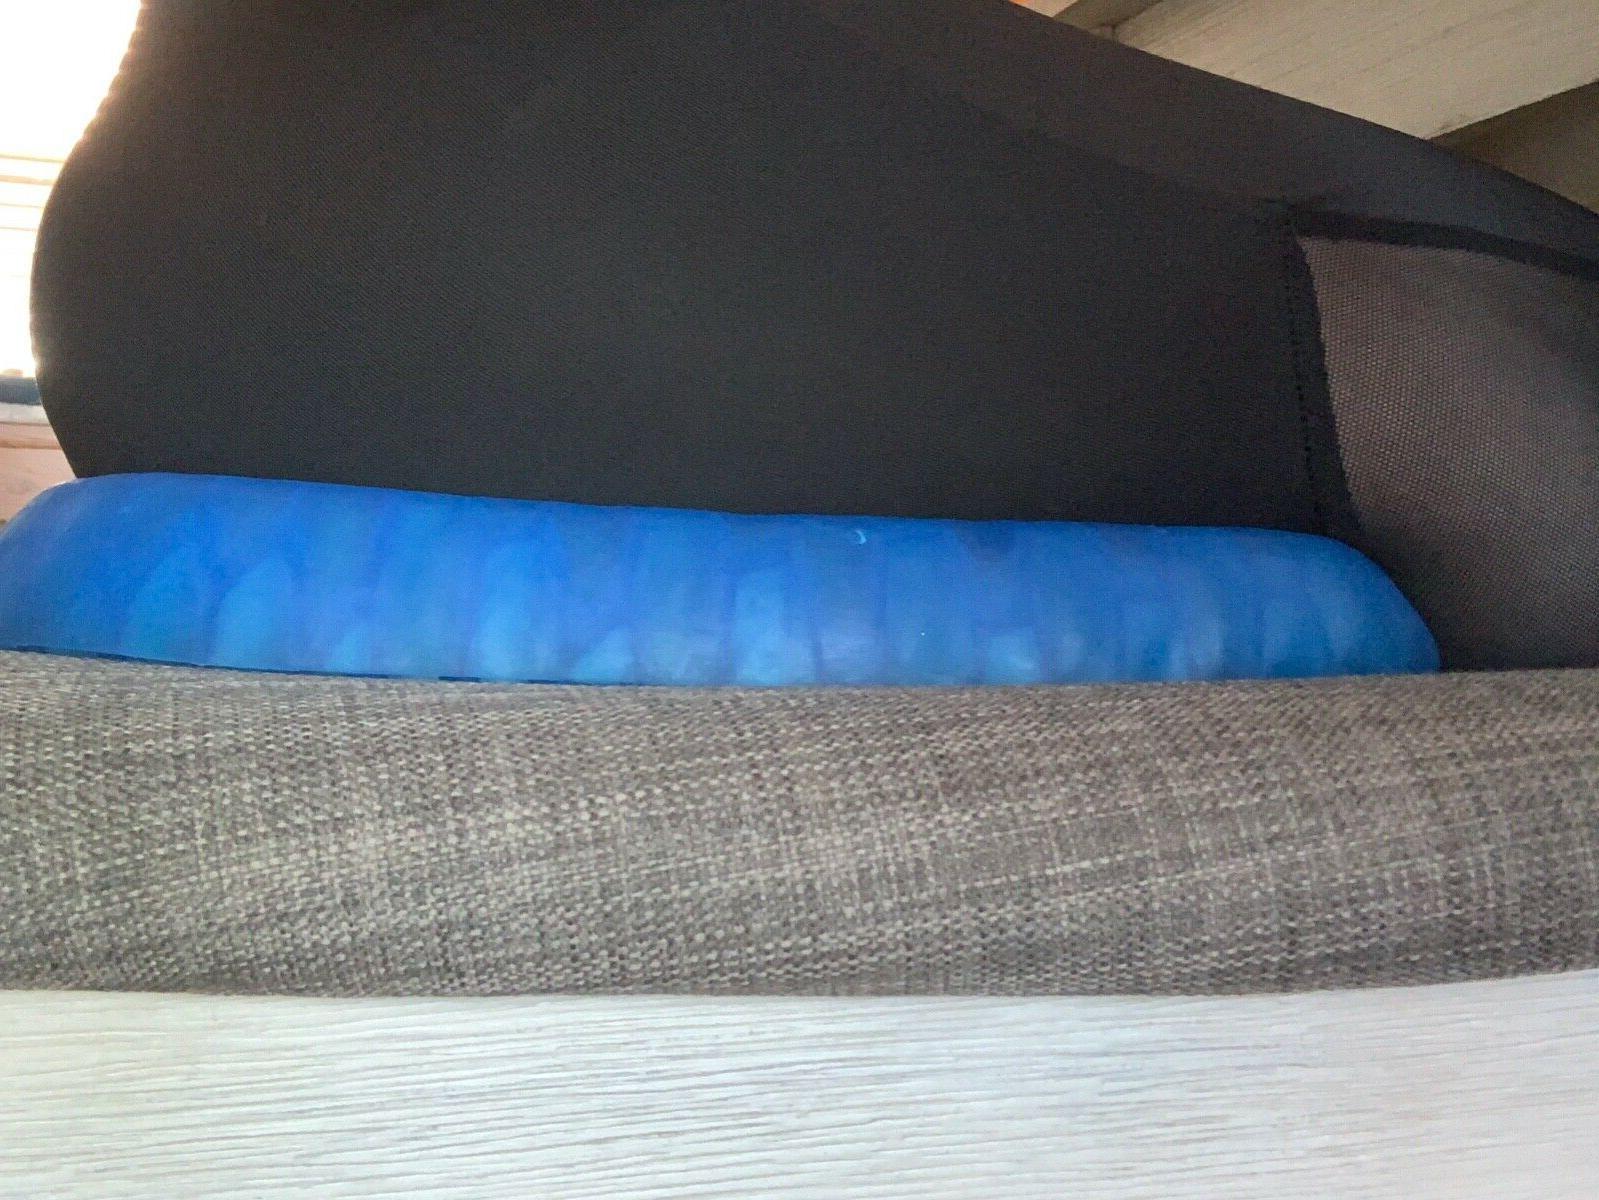 Sarayova Pad Cushion Seat Honeycomb Gel Structured Back